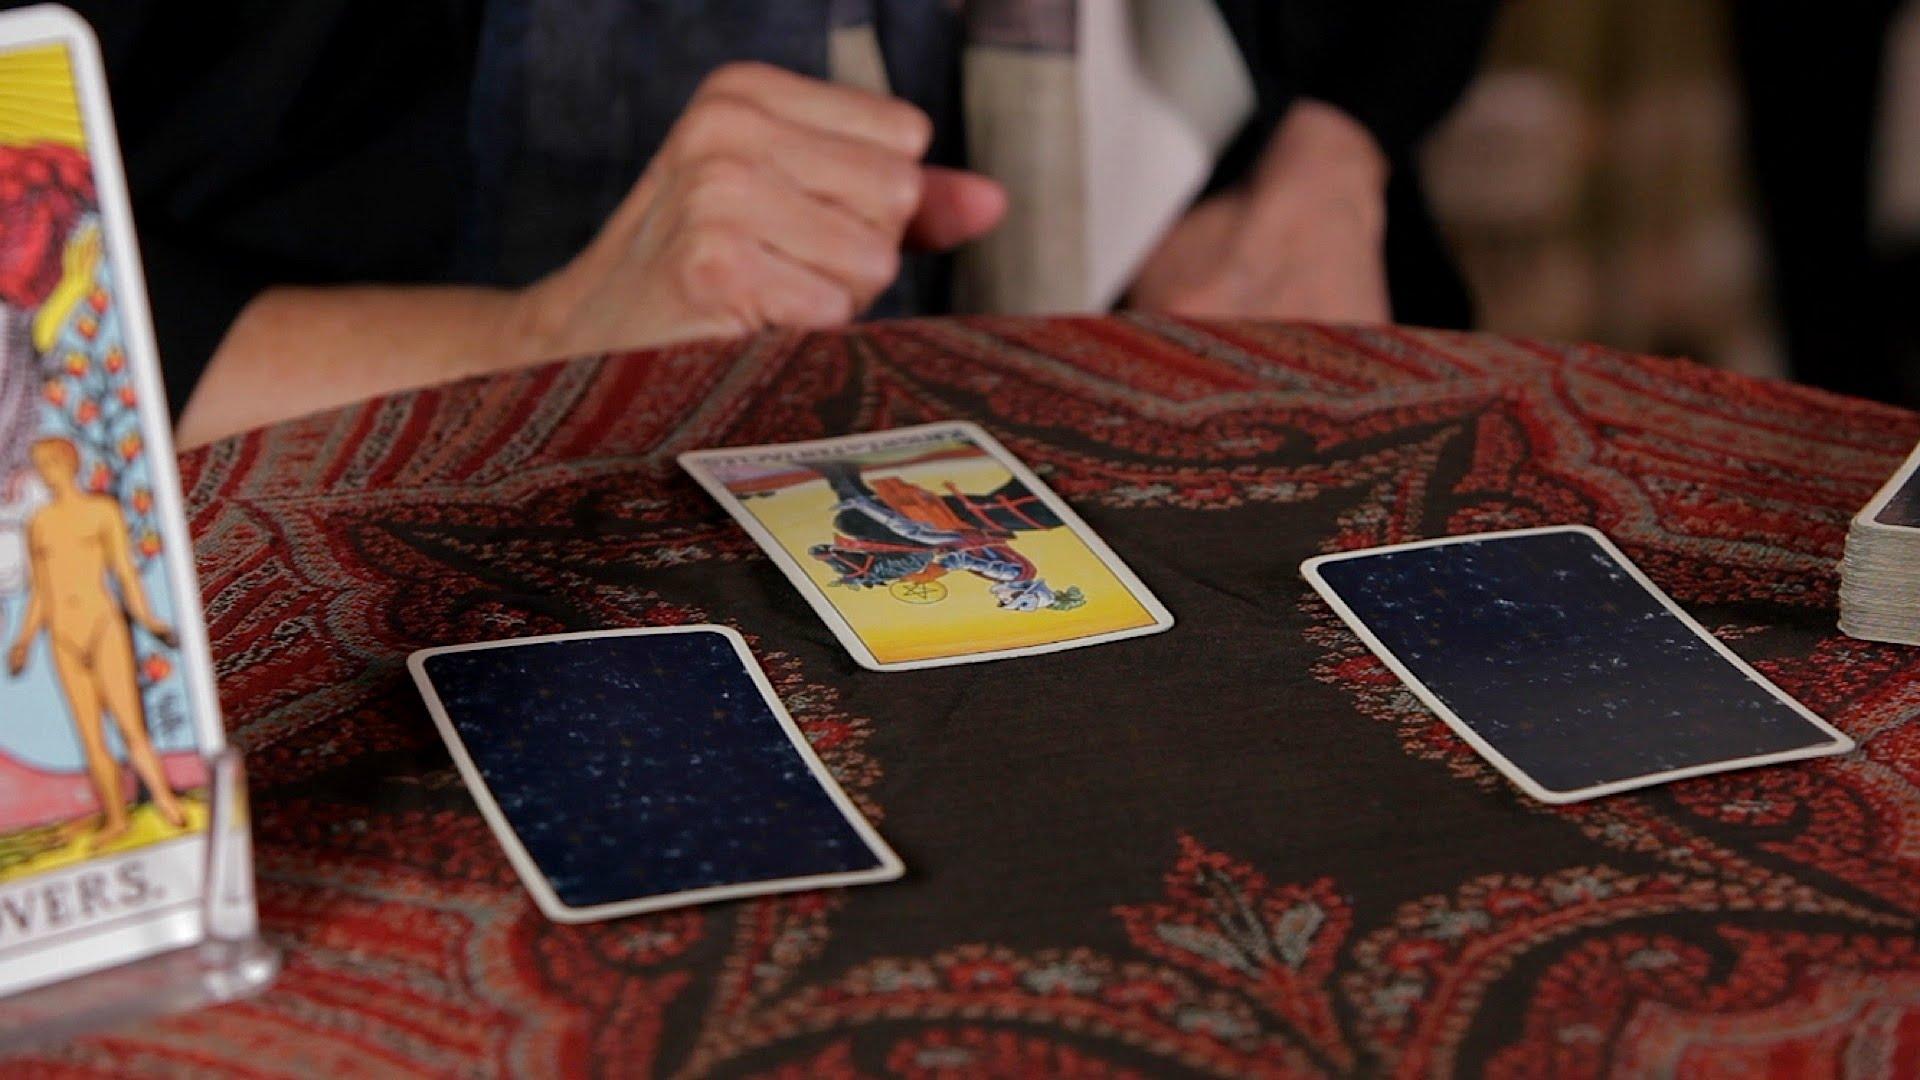 Tarot tarot-si-o-no Tarot del Sí o No ✓ tarot sí o no